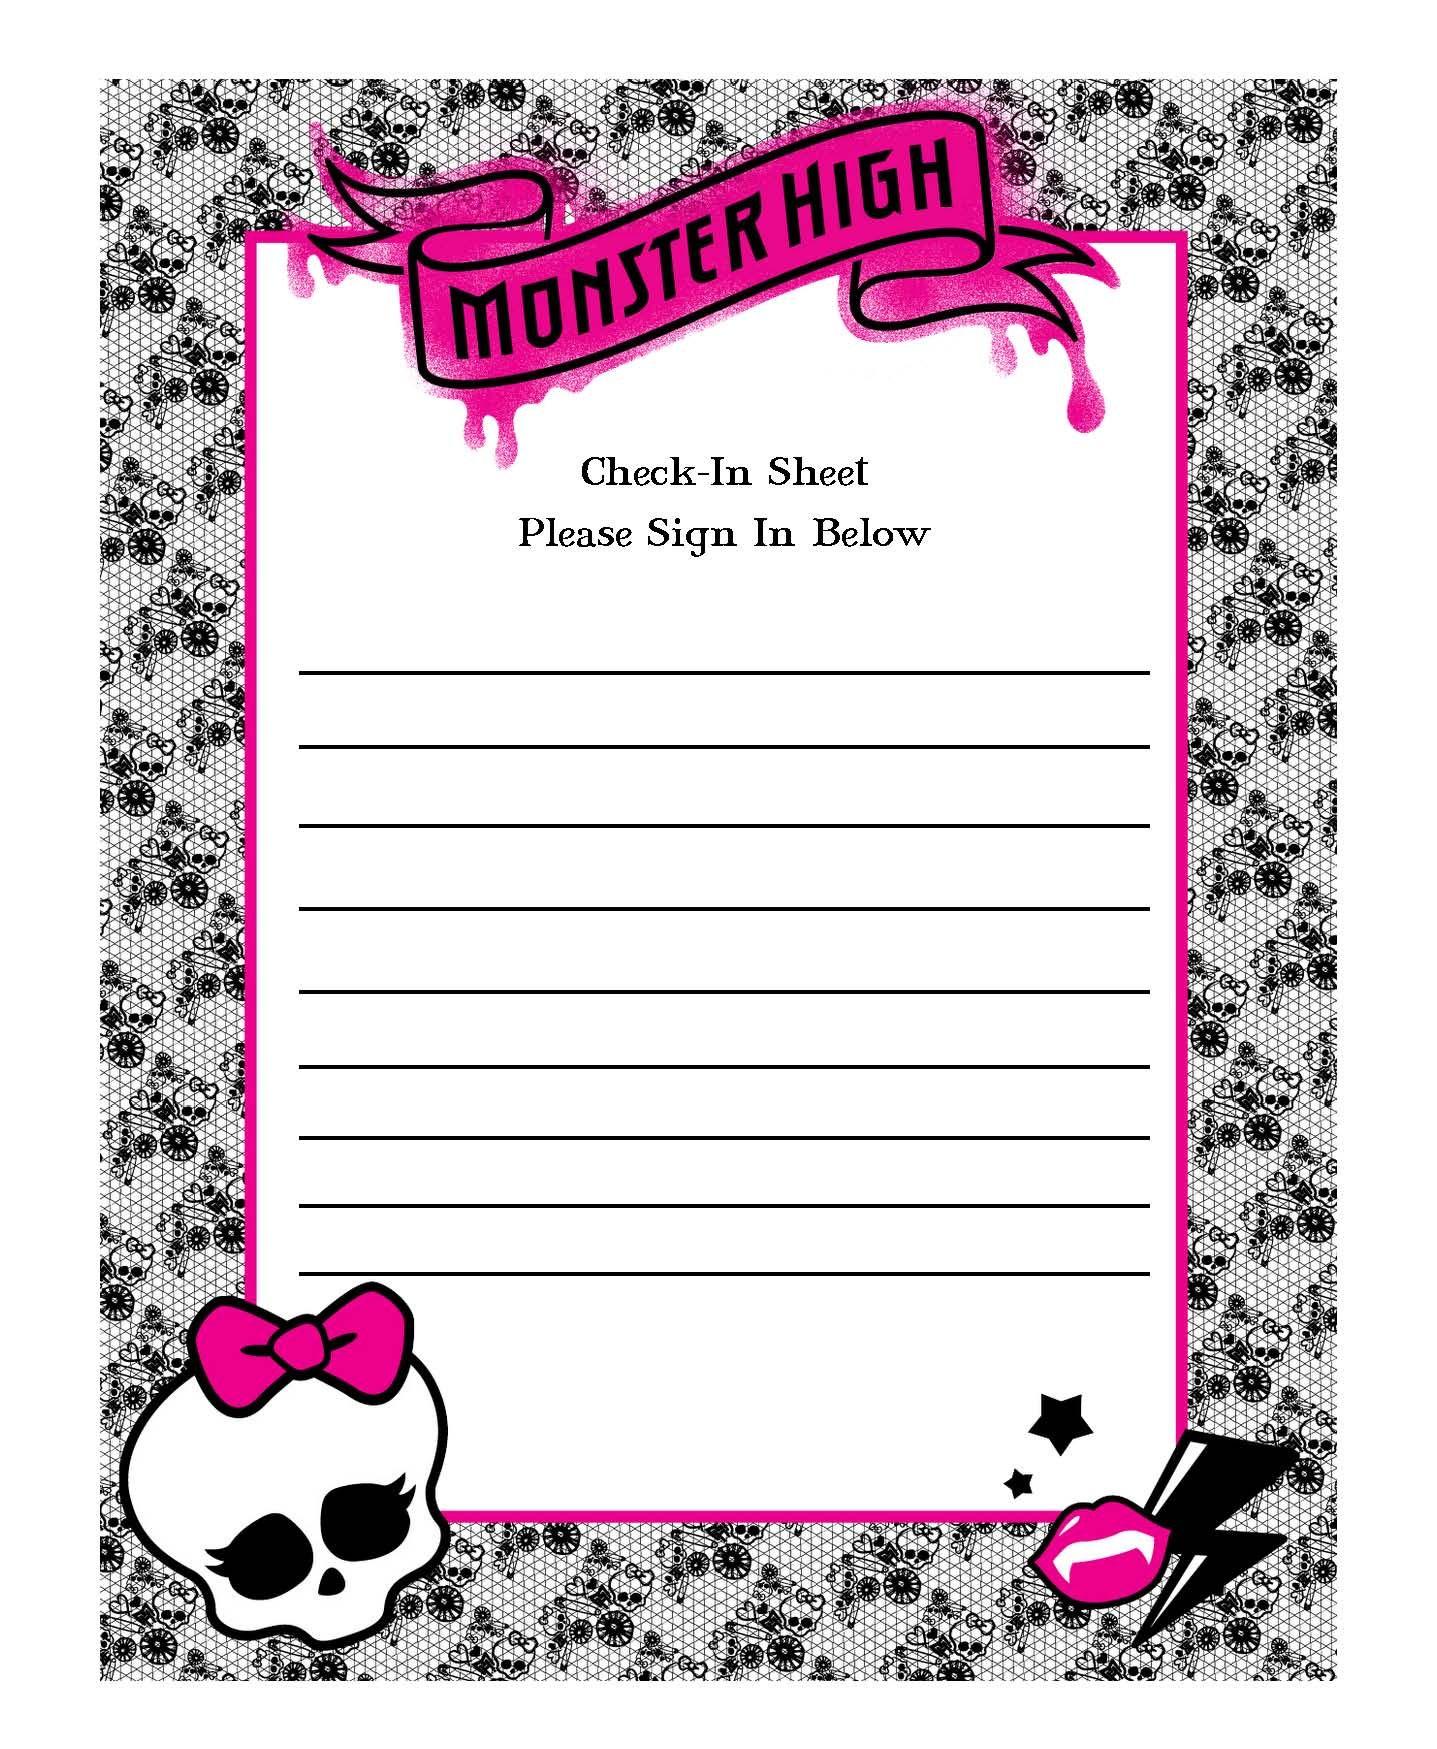 Uncategorized Monster High Activity monster high birthday party sign in sheet monsterhigh signin